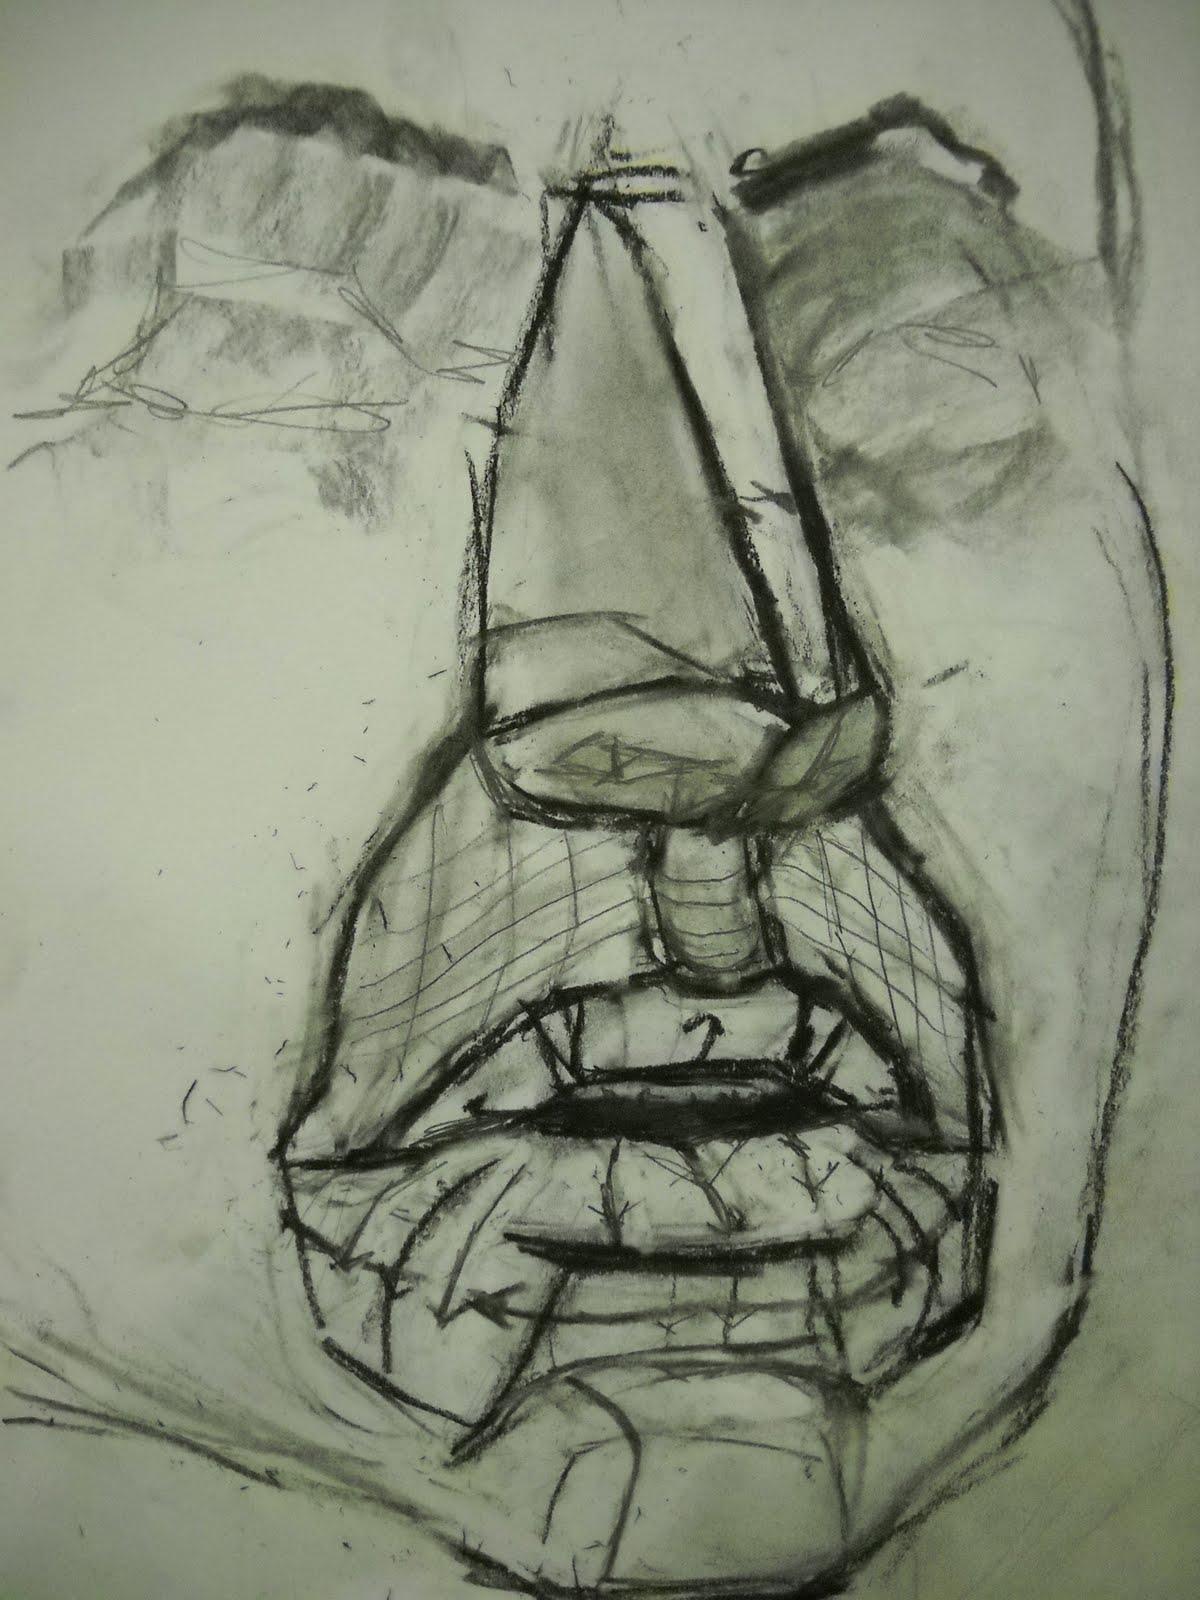 Swift interpreting drawings facial features